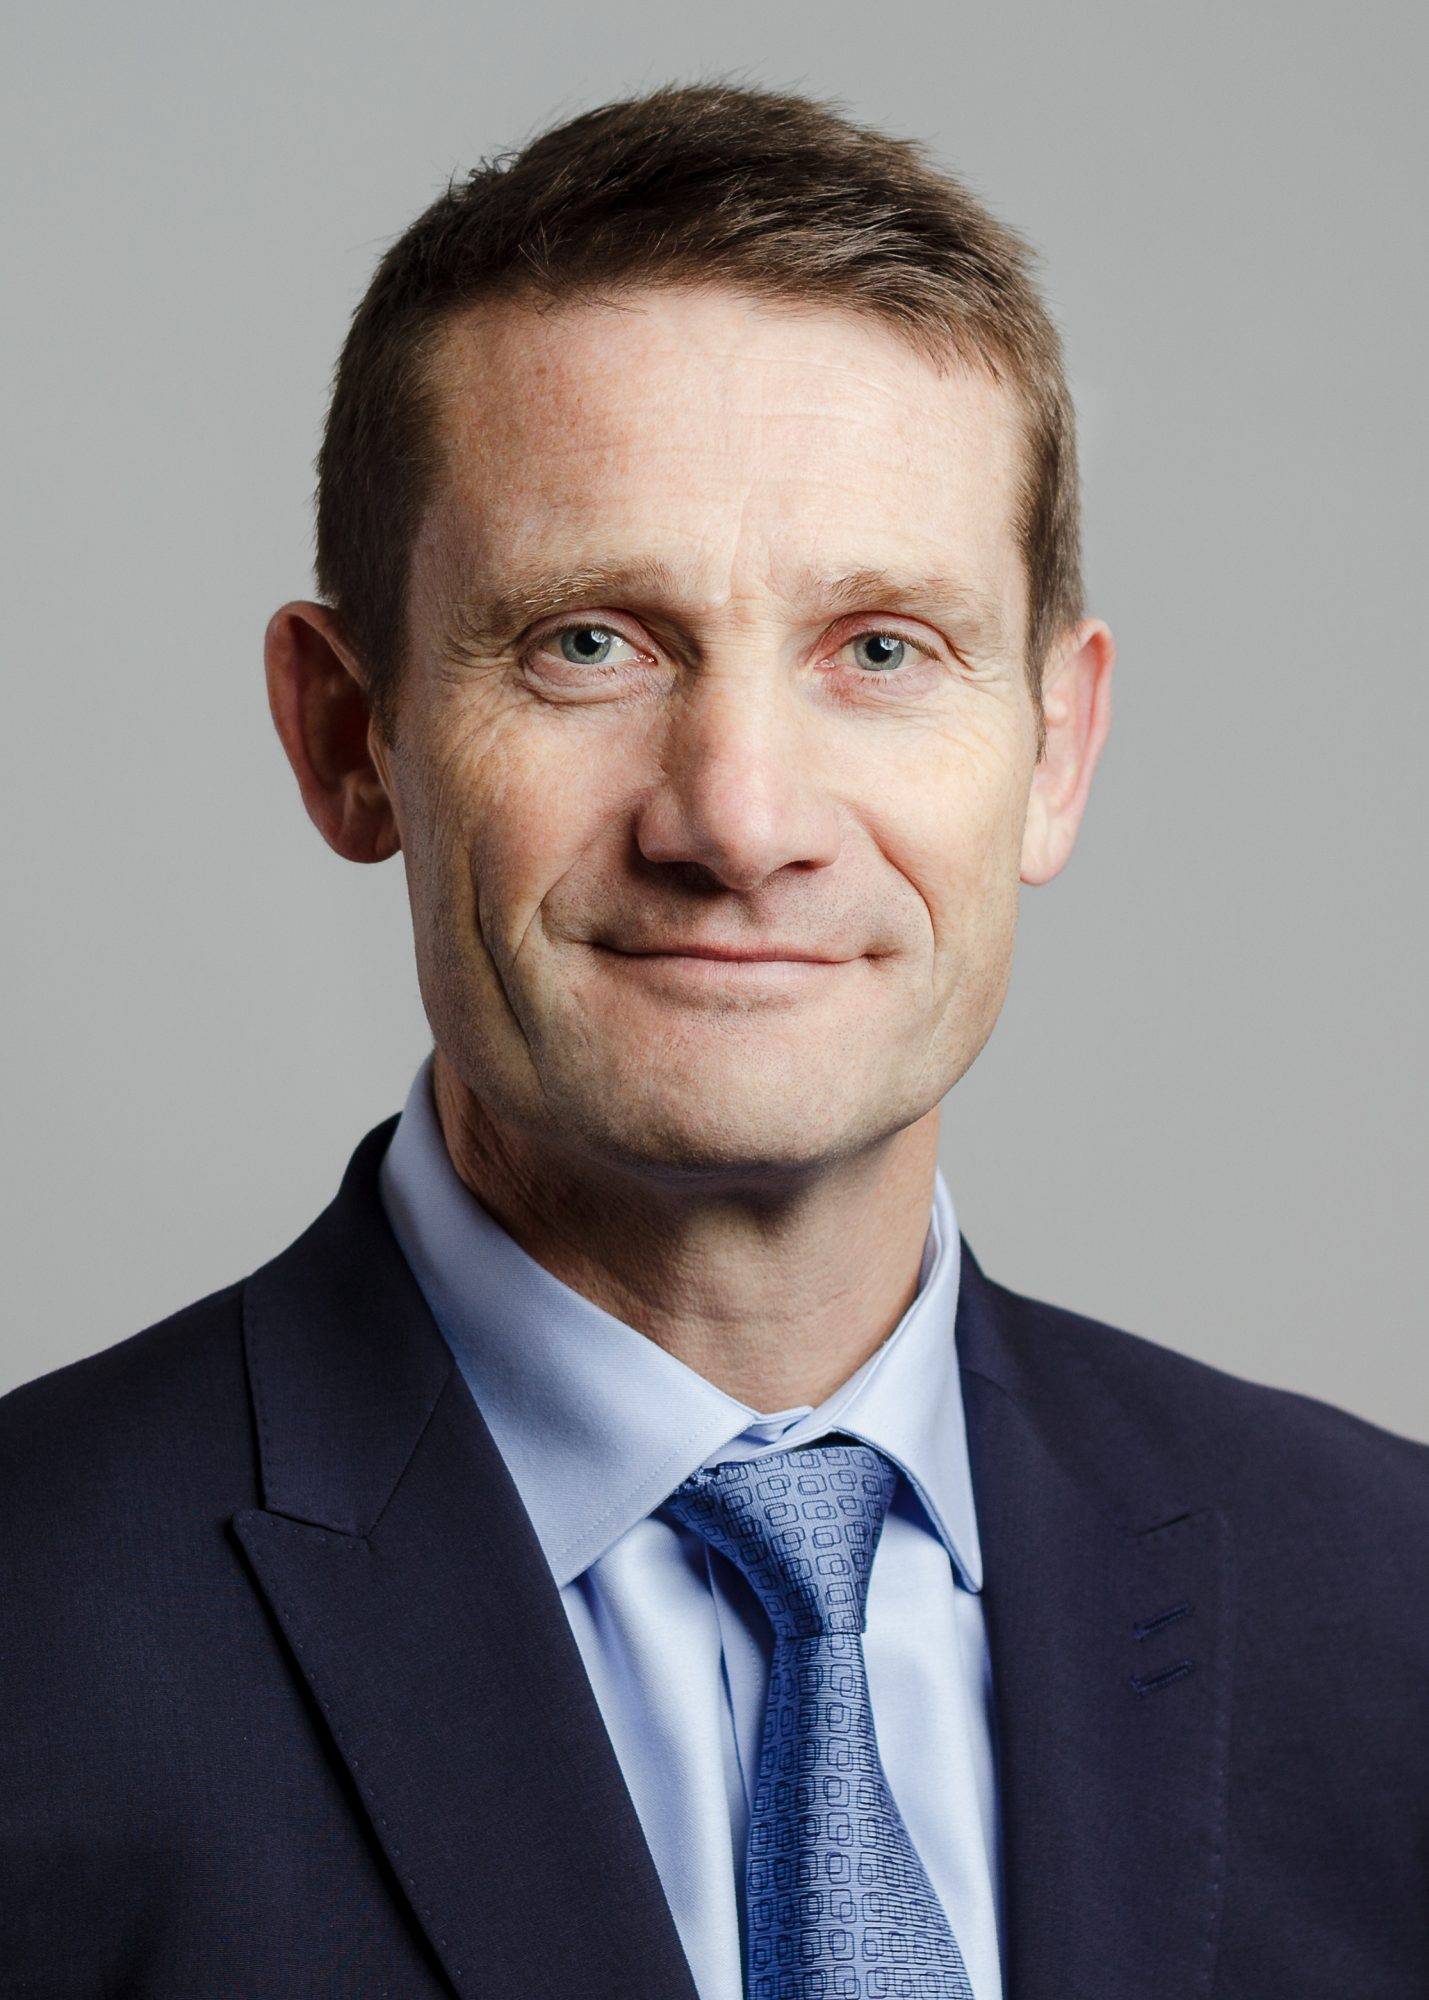 Dr John Hopley